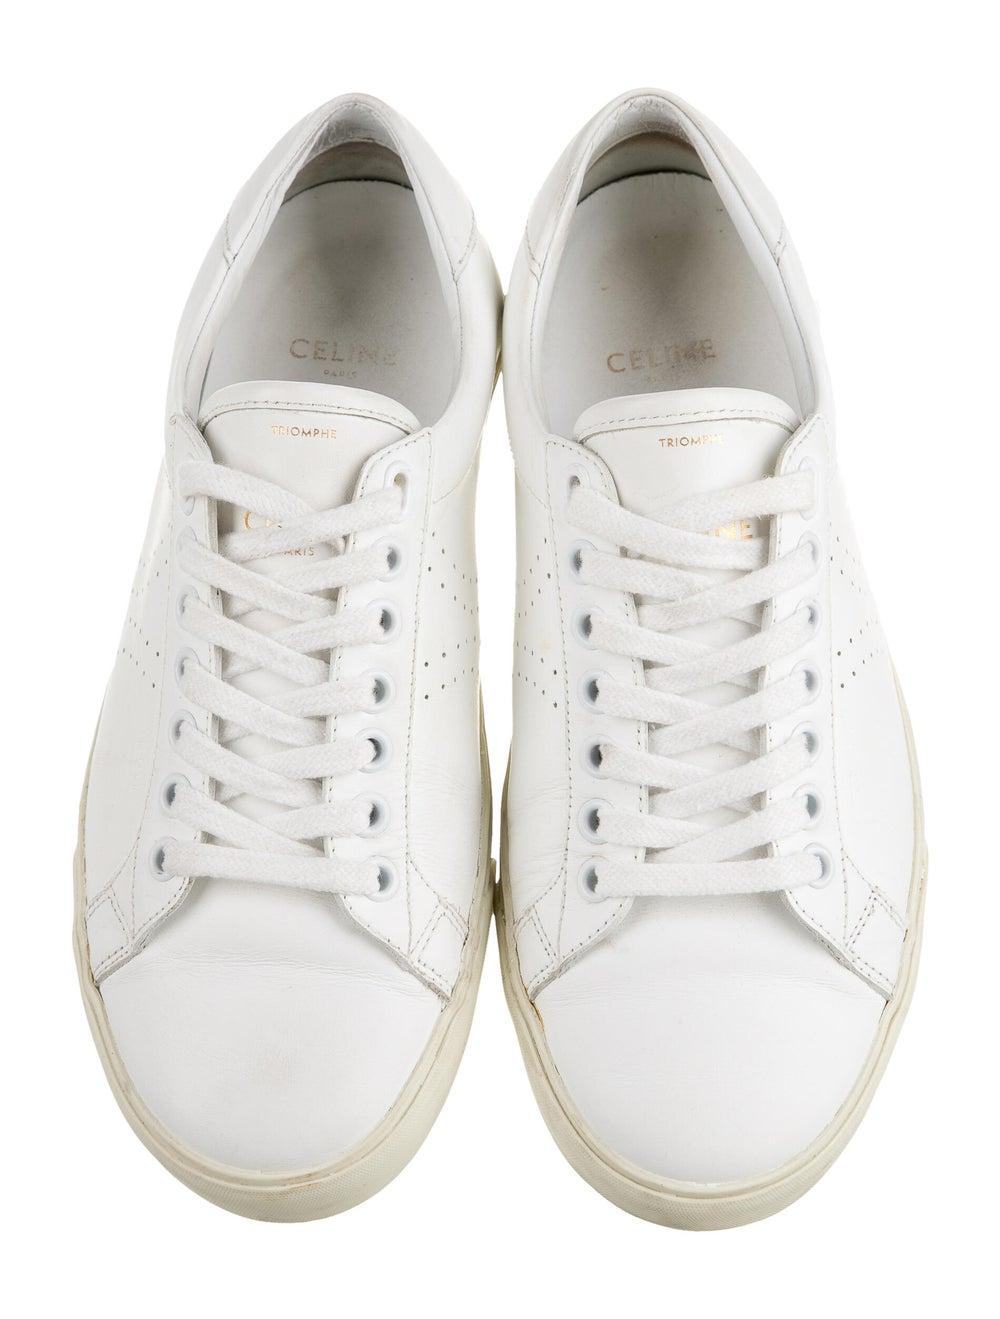 Celine Triomphe Sneakers White - image 3